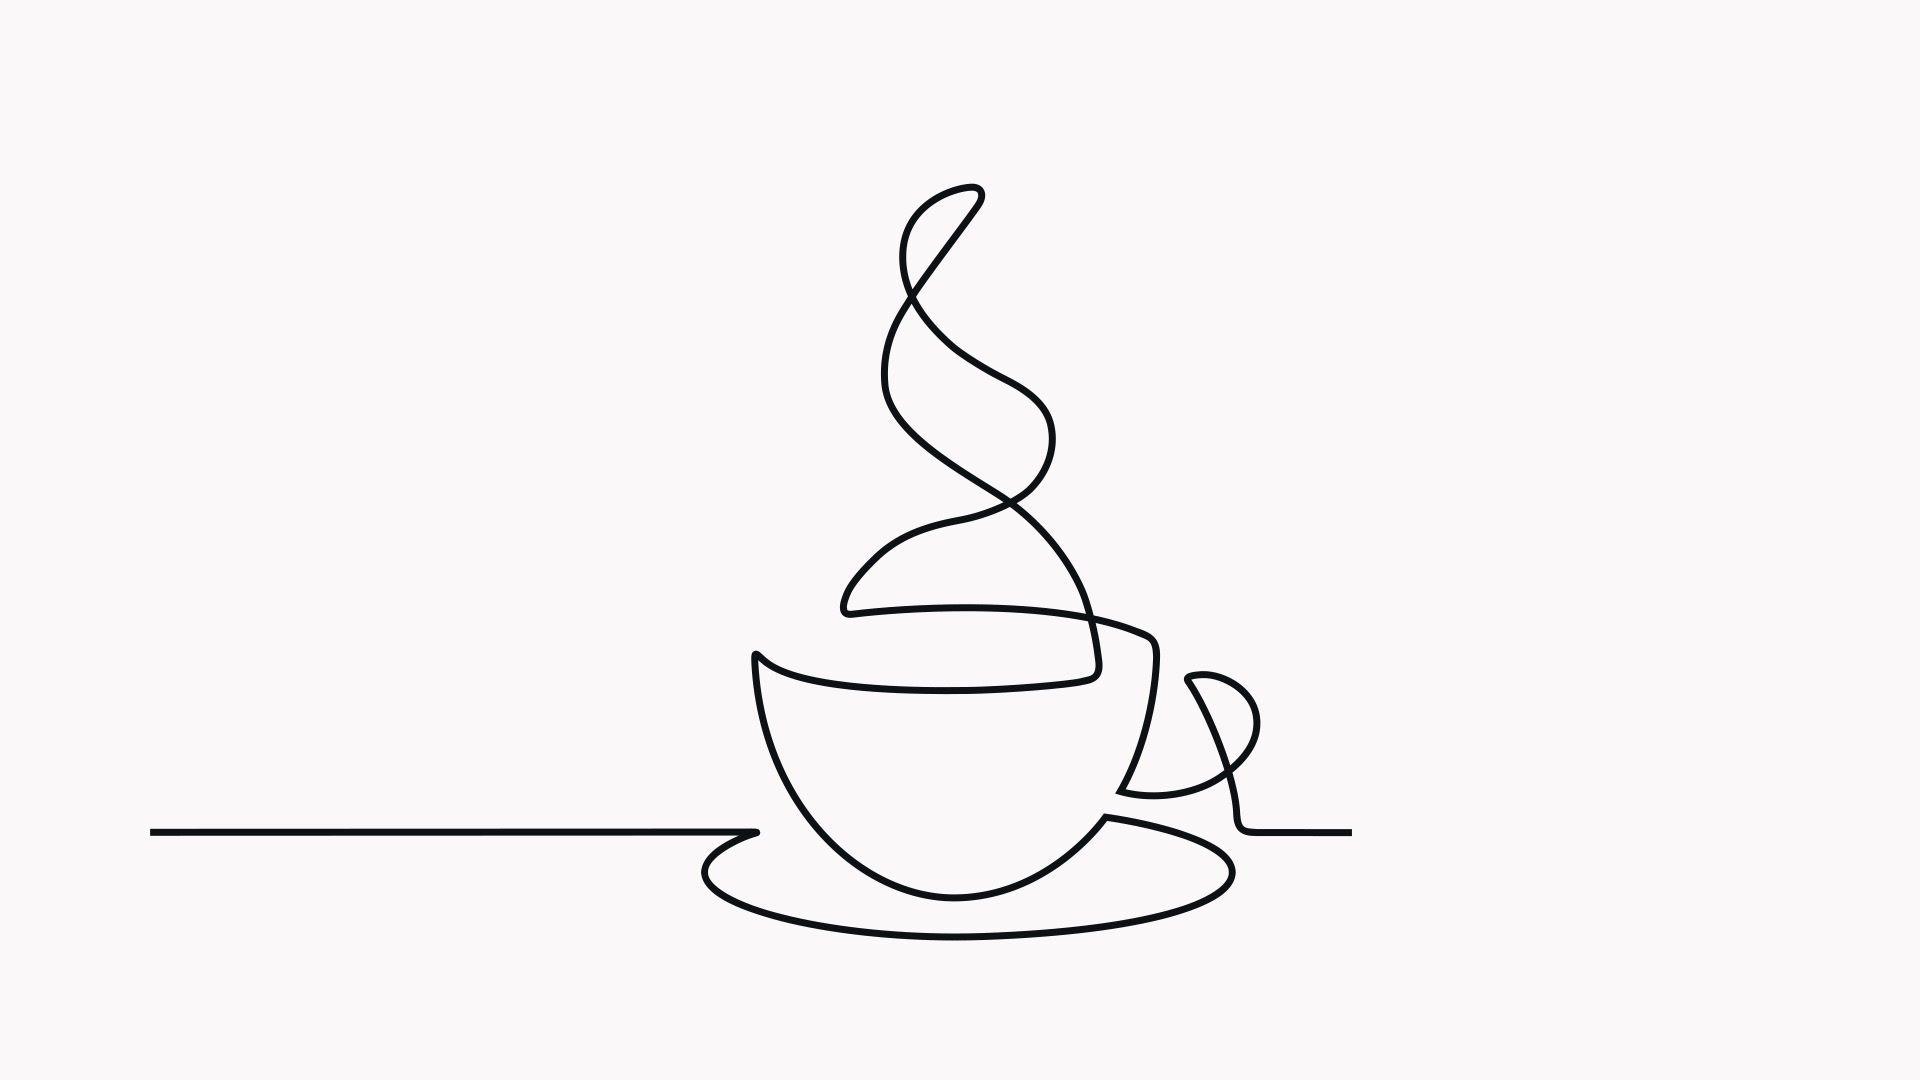 Coffee cup smoke Stock Footage,#cup#Coffee#smoke#Footage - Coffee cup smoke Stock Footage,#cup#Coffee#smoke#Footage - #Coffee #CoffeeArt #Cup #footage #FootagecupCoffeesmokeFootage #HomeBrewing #smoke #stock #Tea #Wine